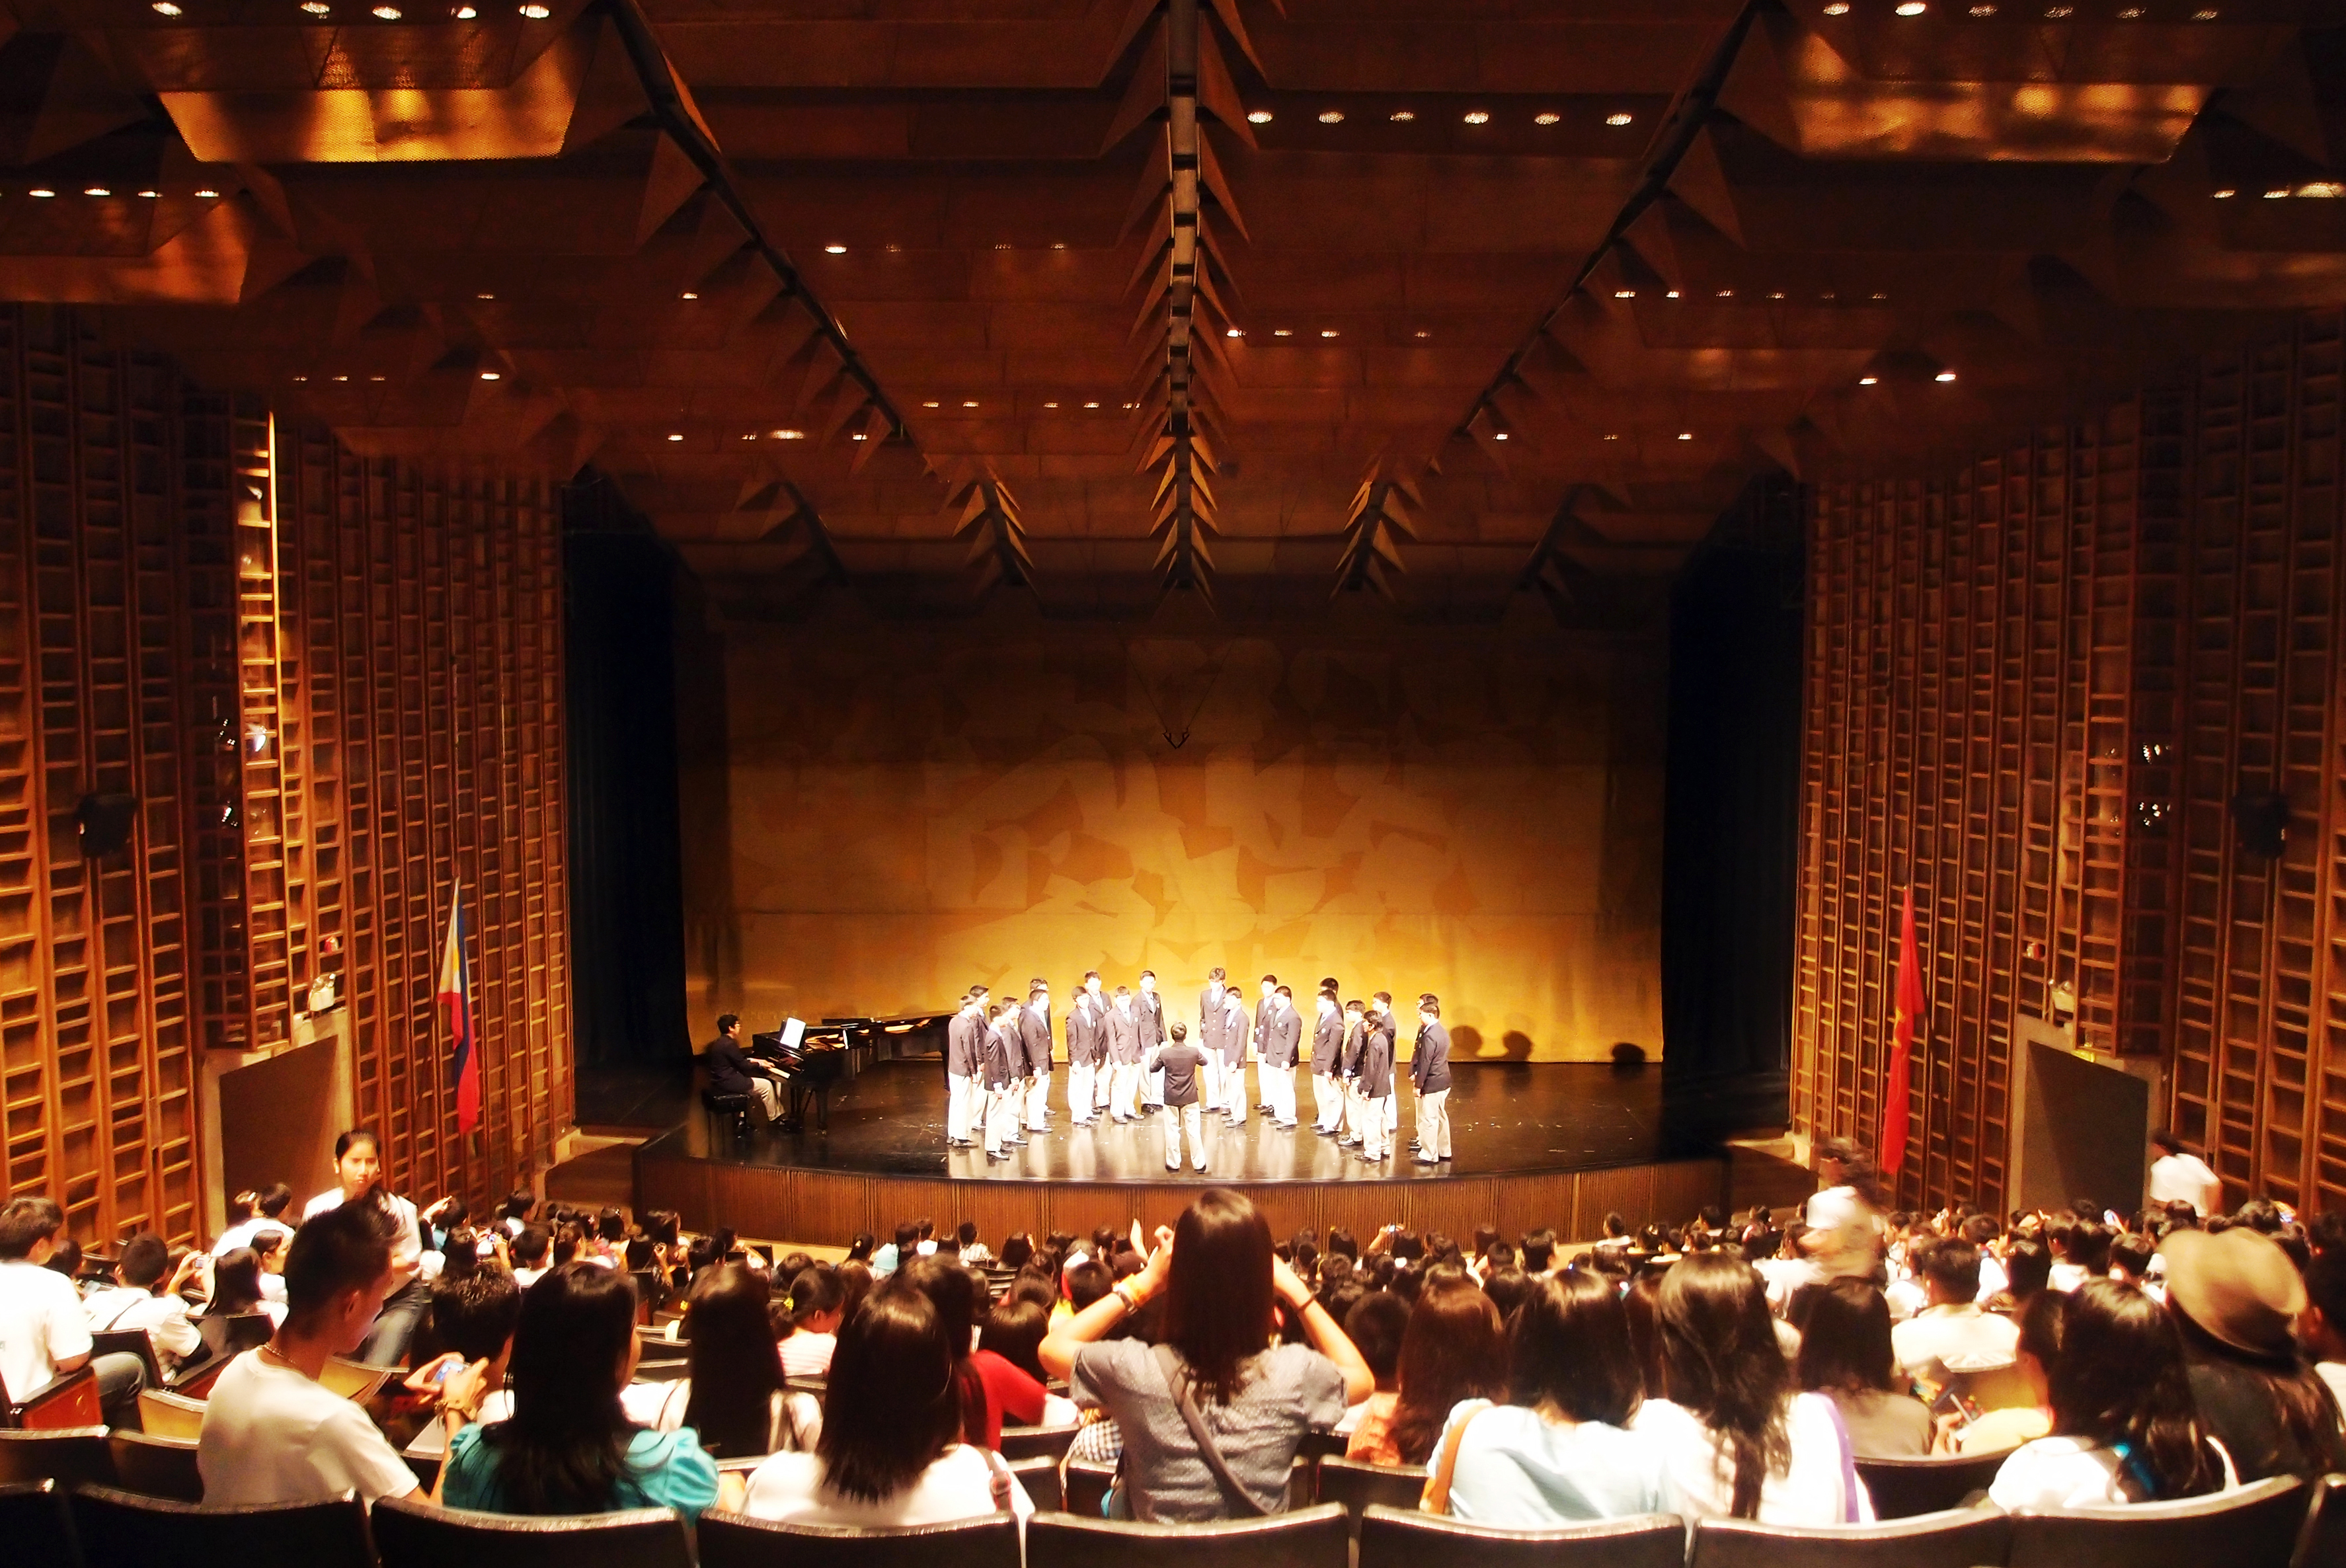 ccp tolentino tanghalang aurelio pambansa cultural wikipedia commons philippines center main wikimedia sa